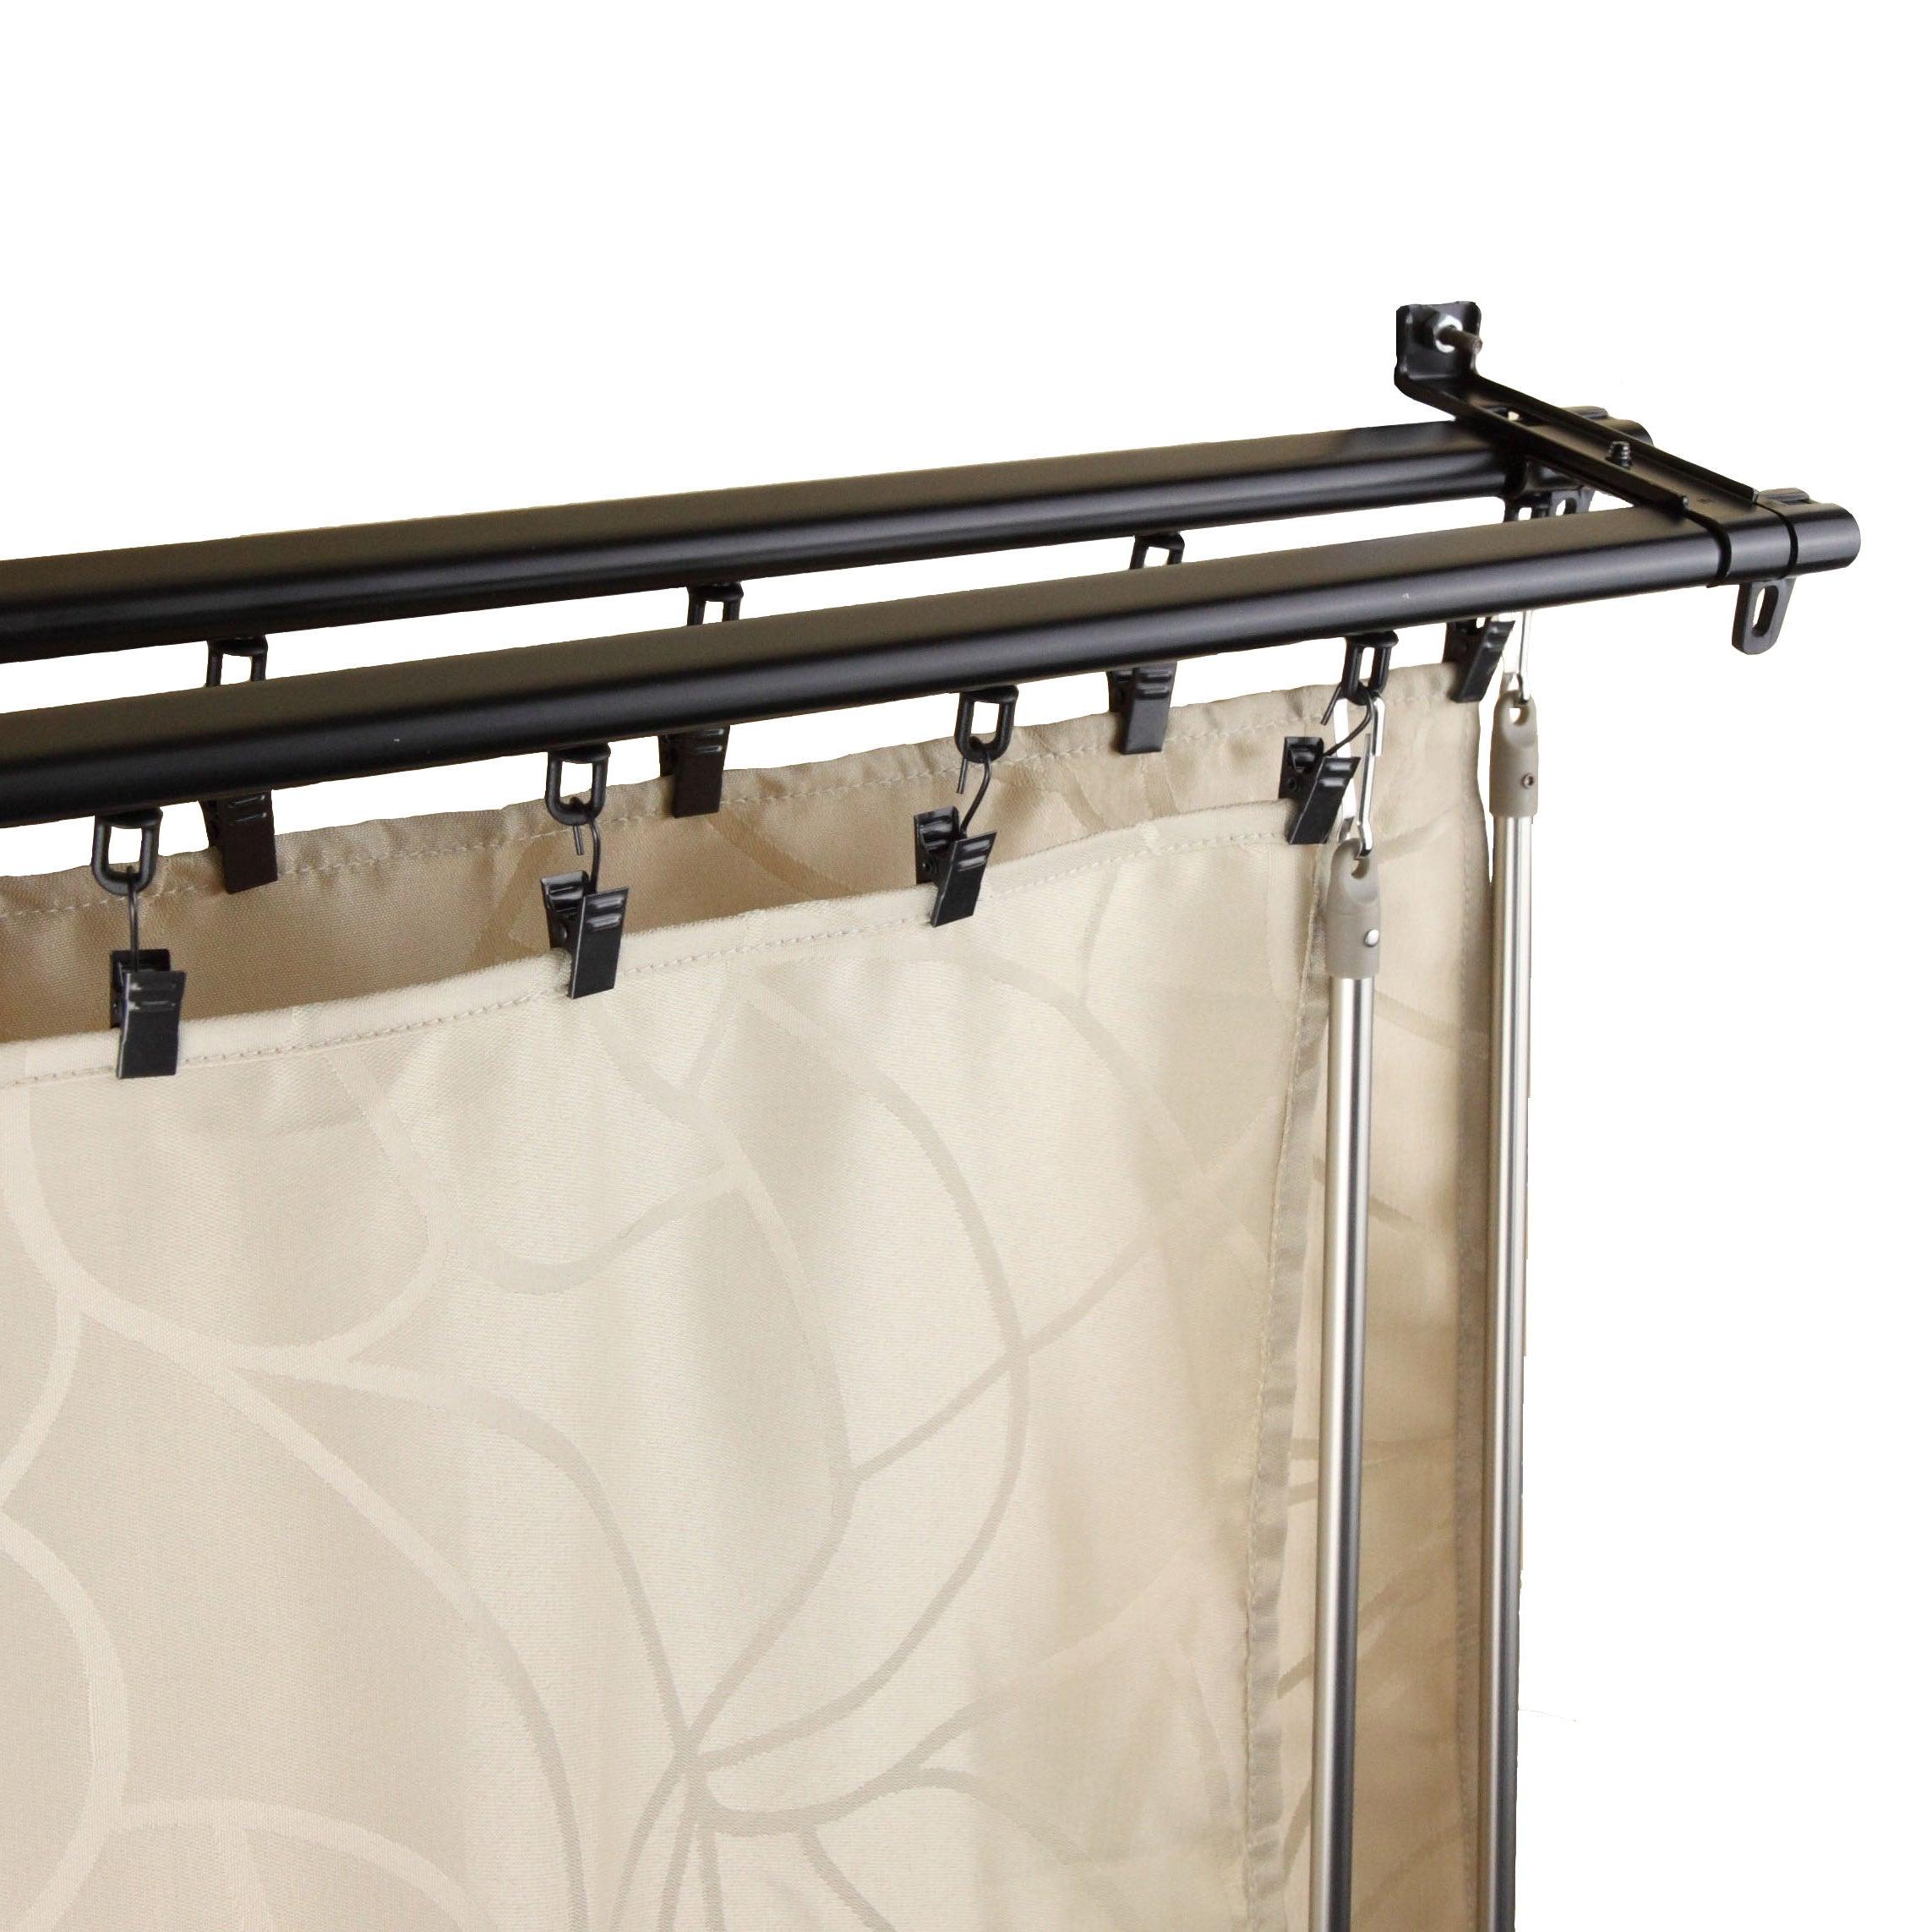 Shop Instyledesign Regal Black Adjustable Double Curtain Rod Track